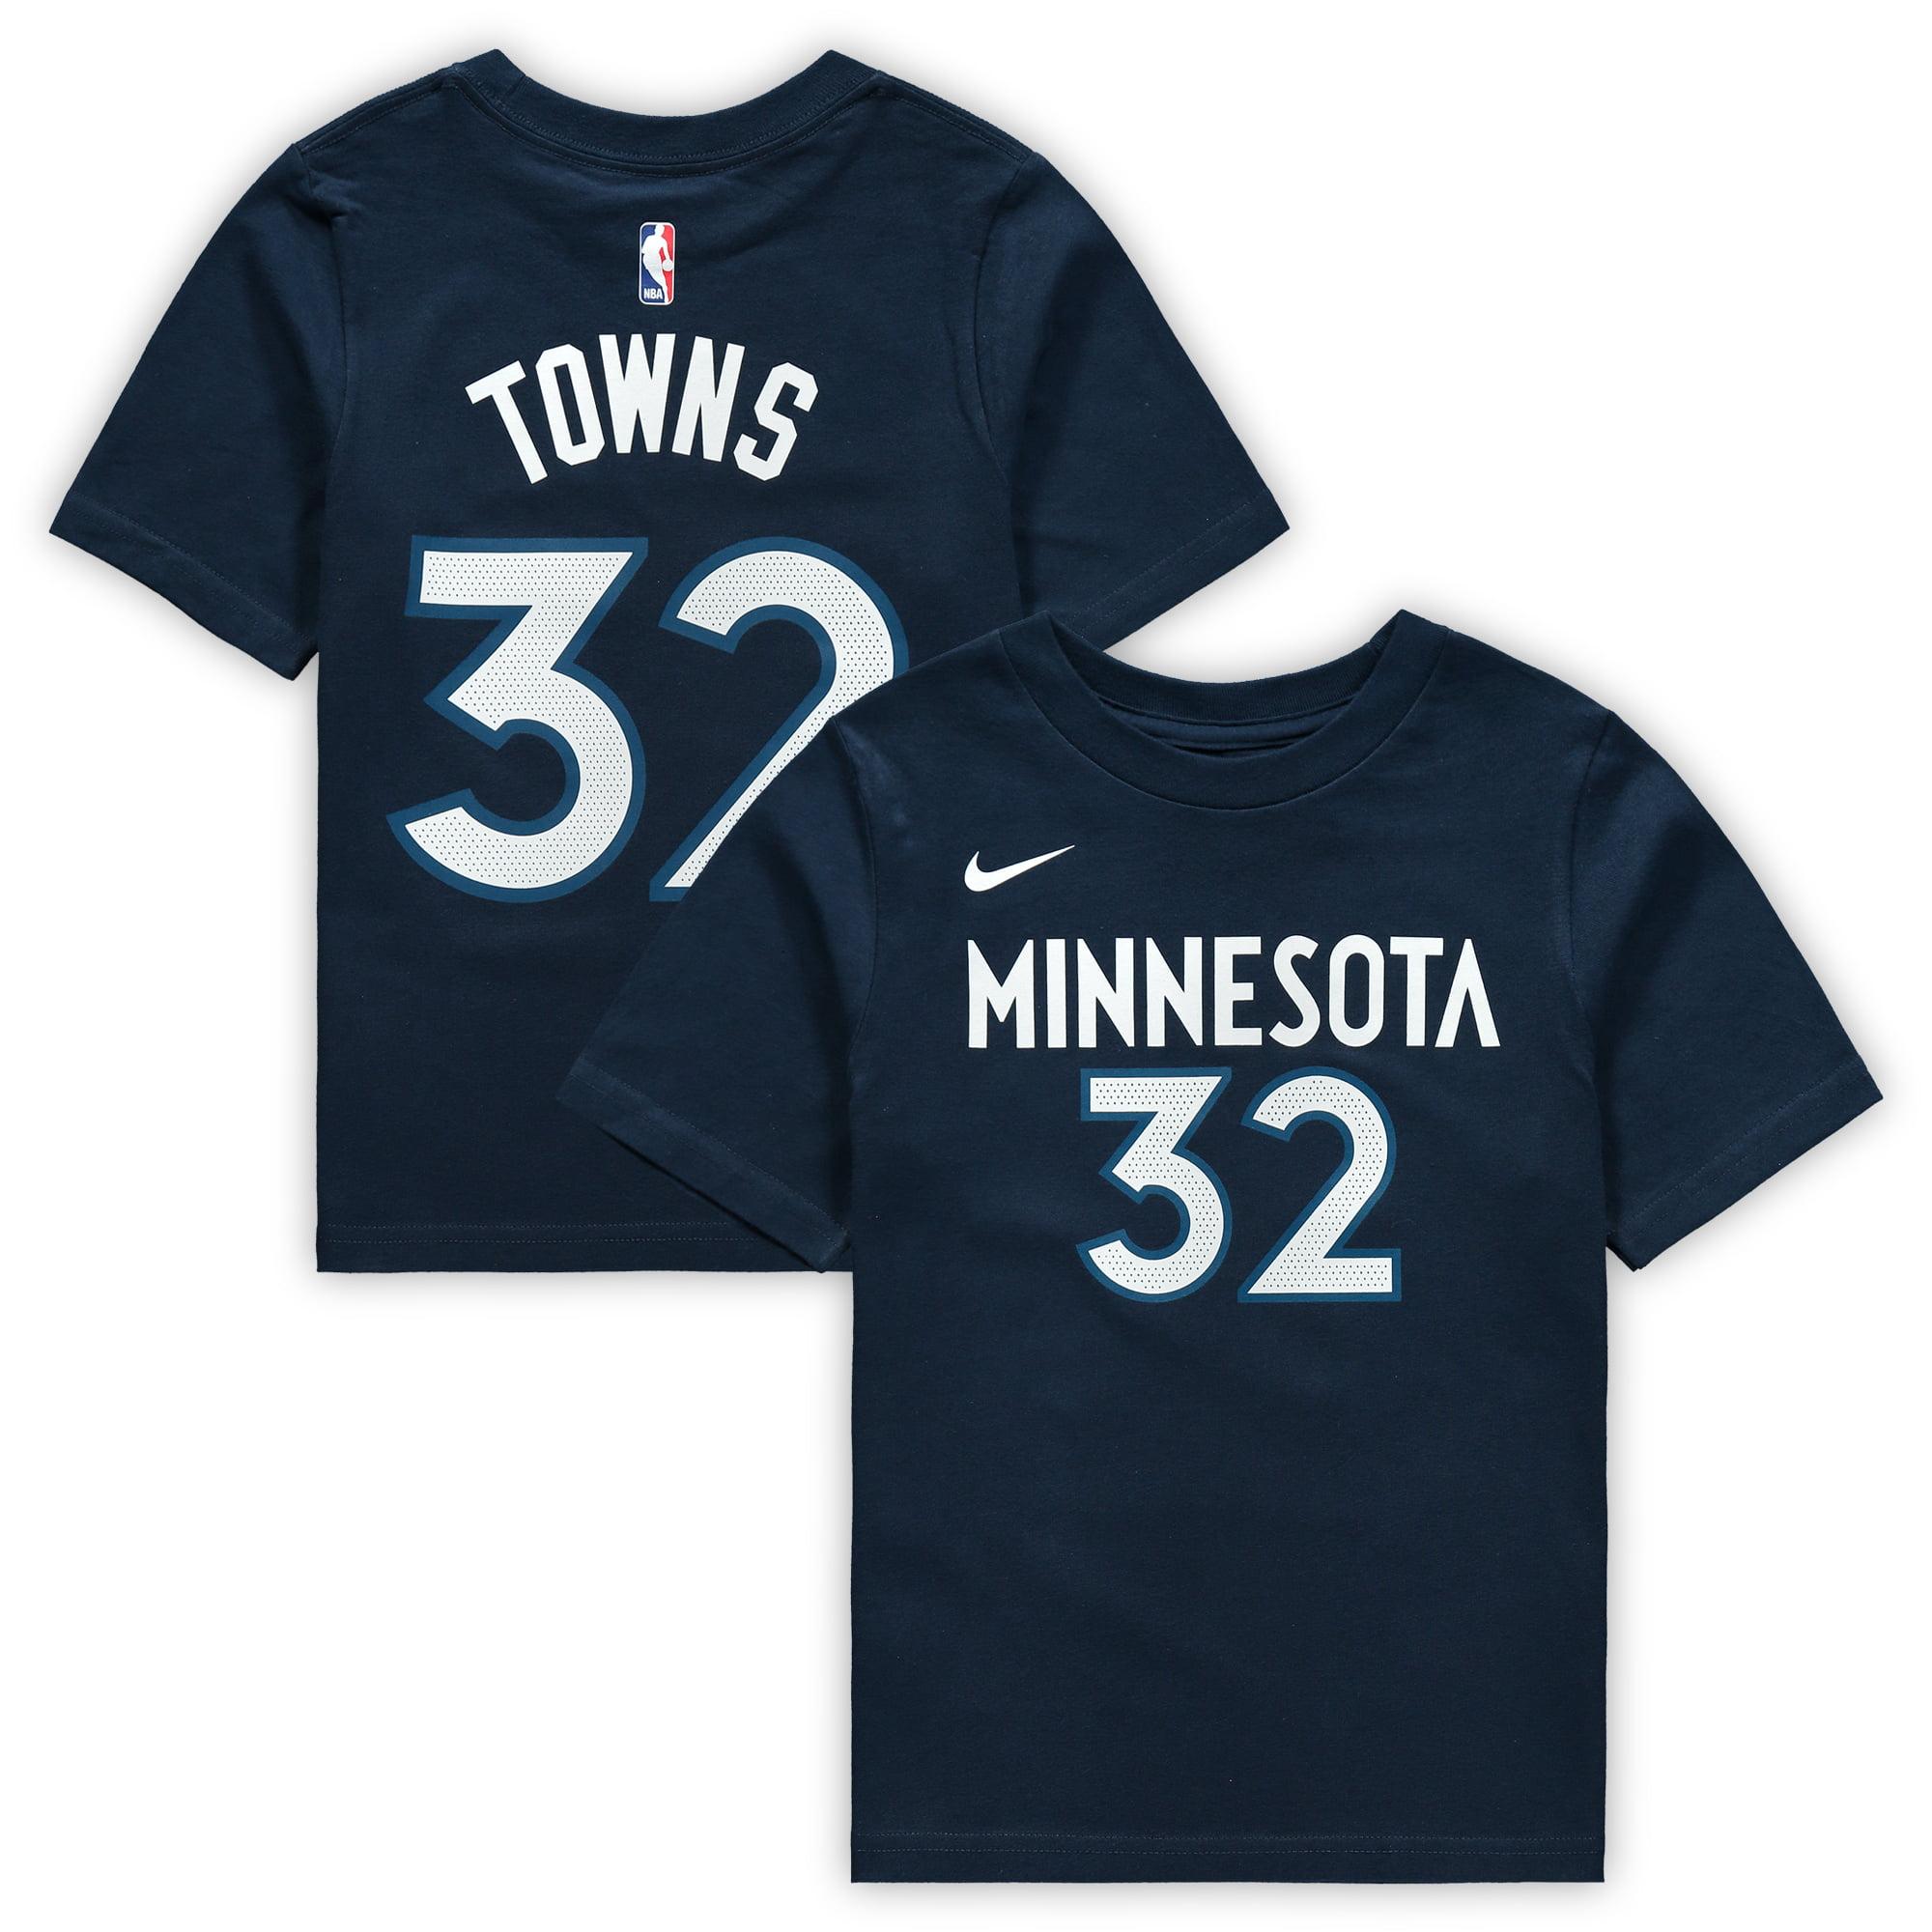 Karl-Anthony Towns Minnesota Timberwolves Nike Preschool Name & Number T-Shirt - Navy